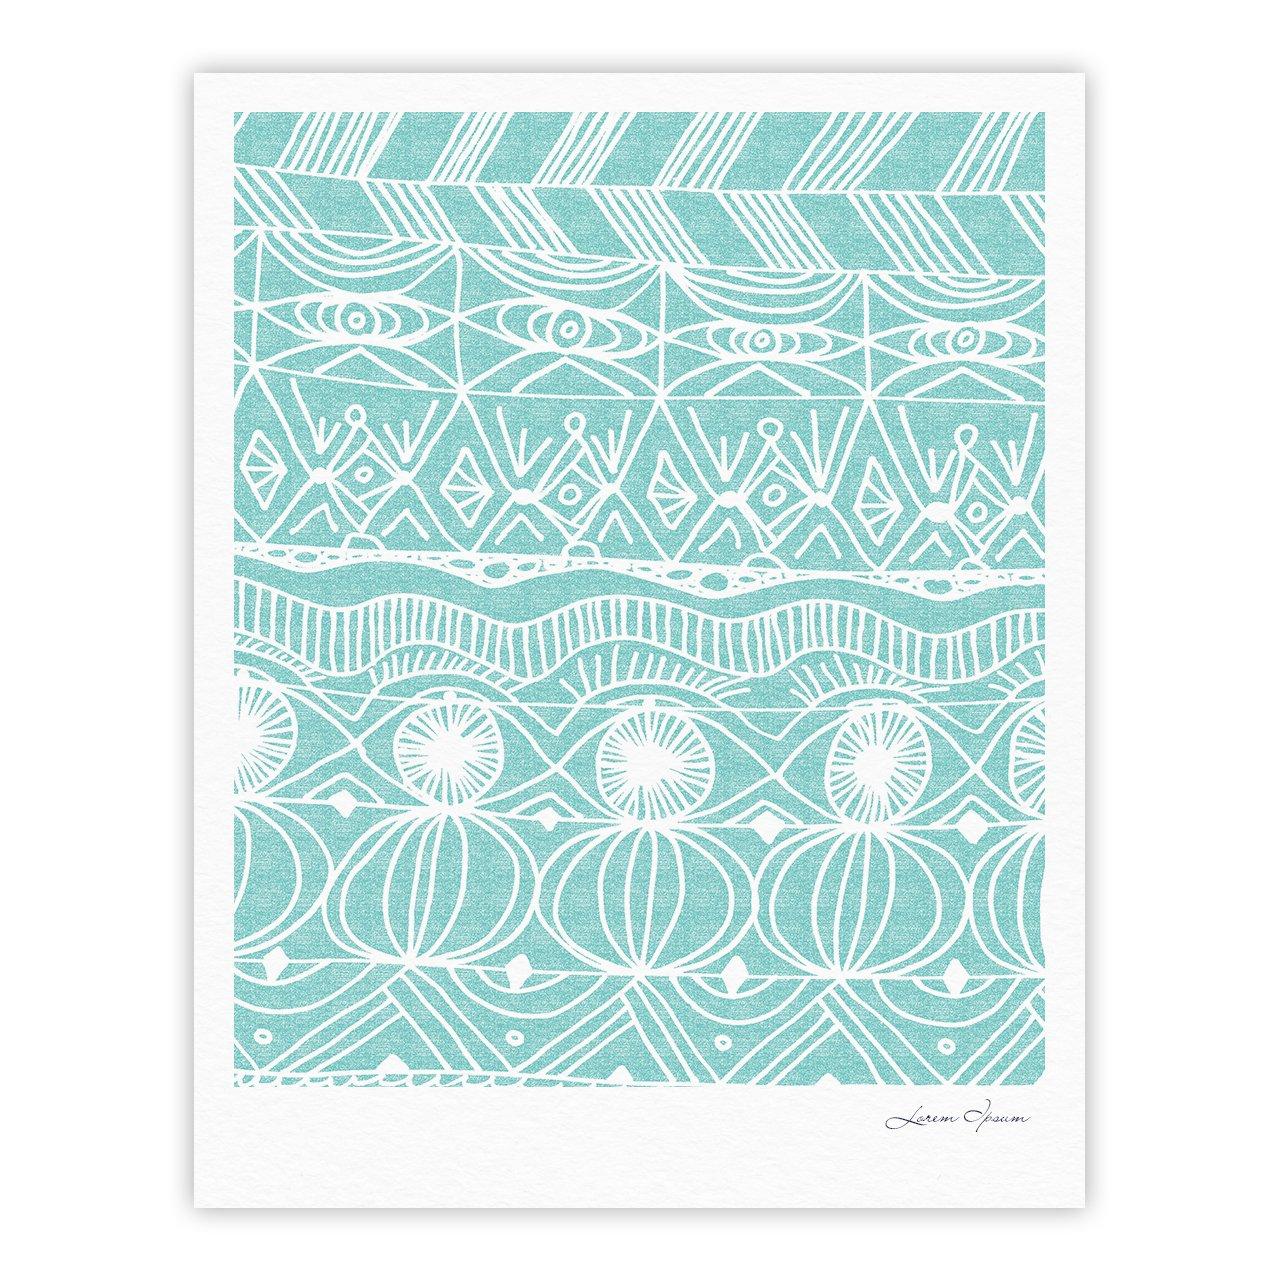 Kess InHouse Catherine Holcombe Beach Blanket Bingo Gallery Art Print, 24 by 36-Inch